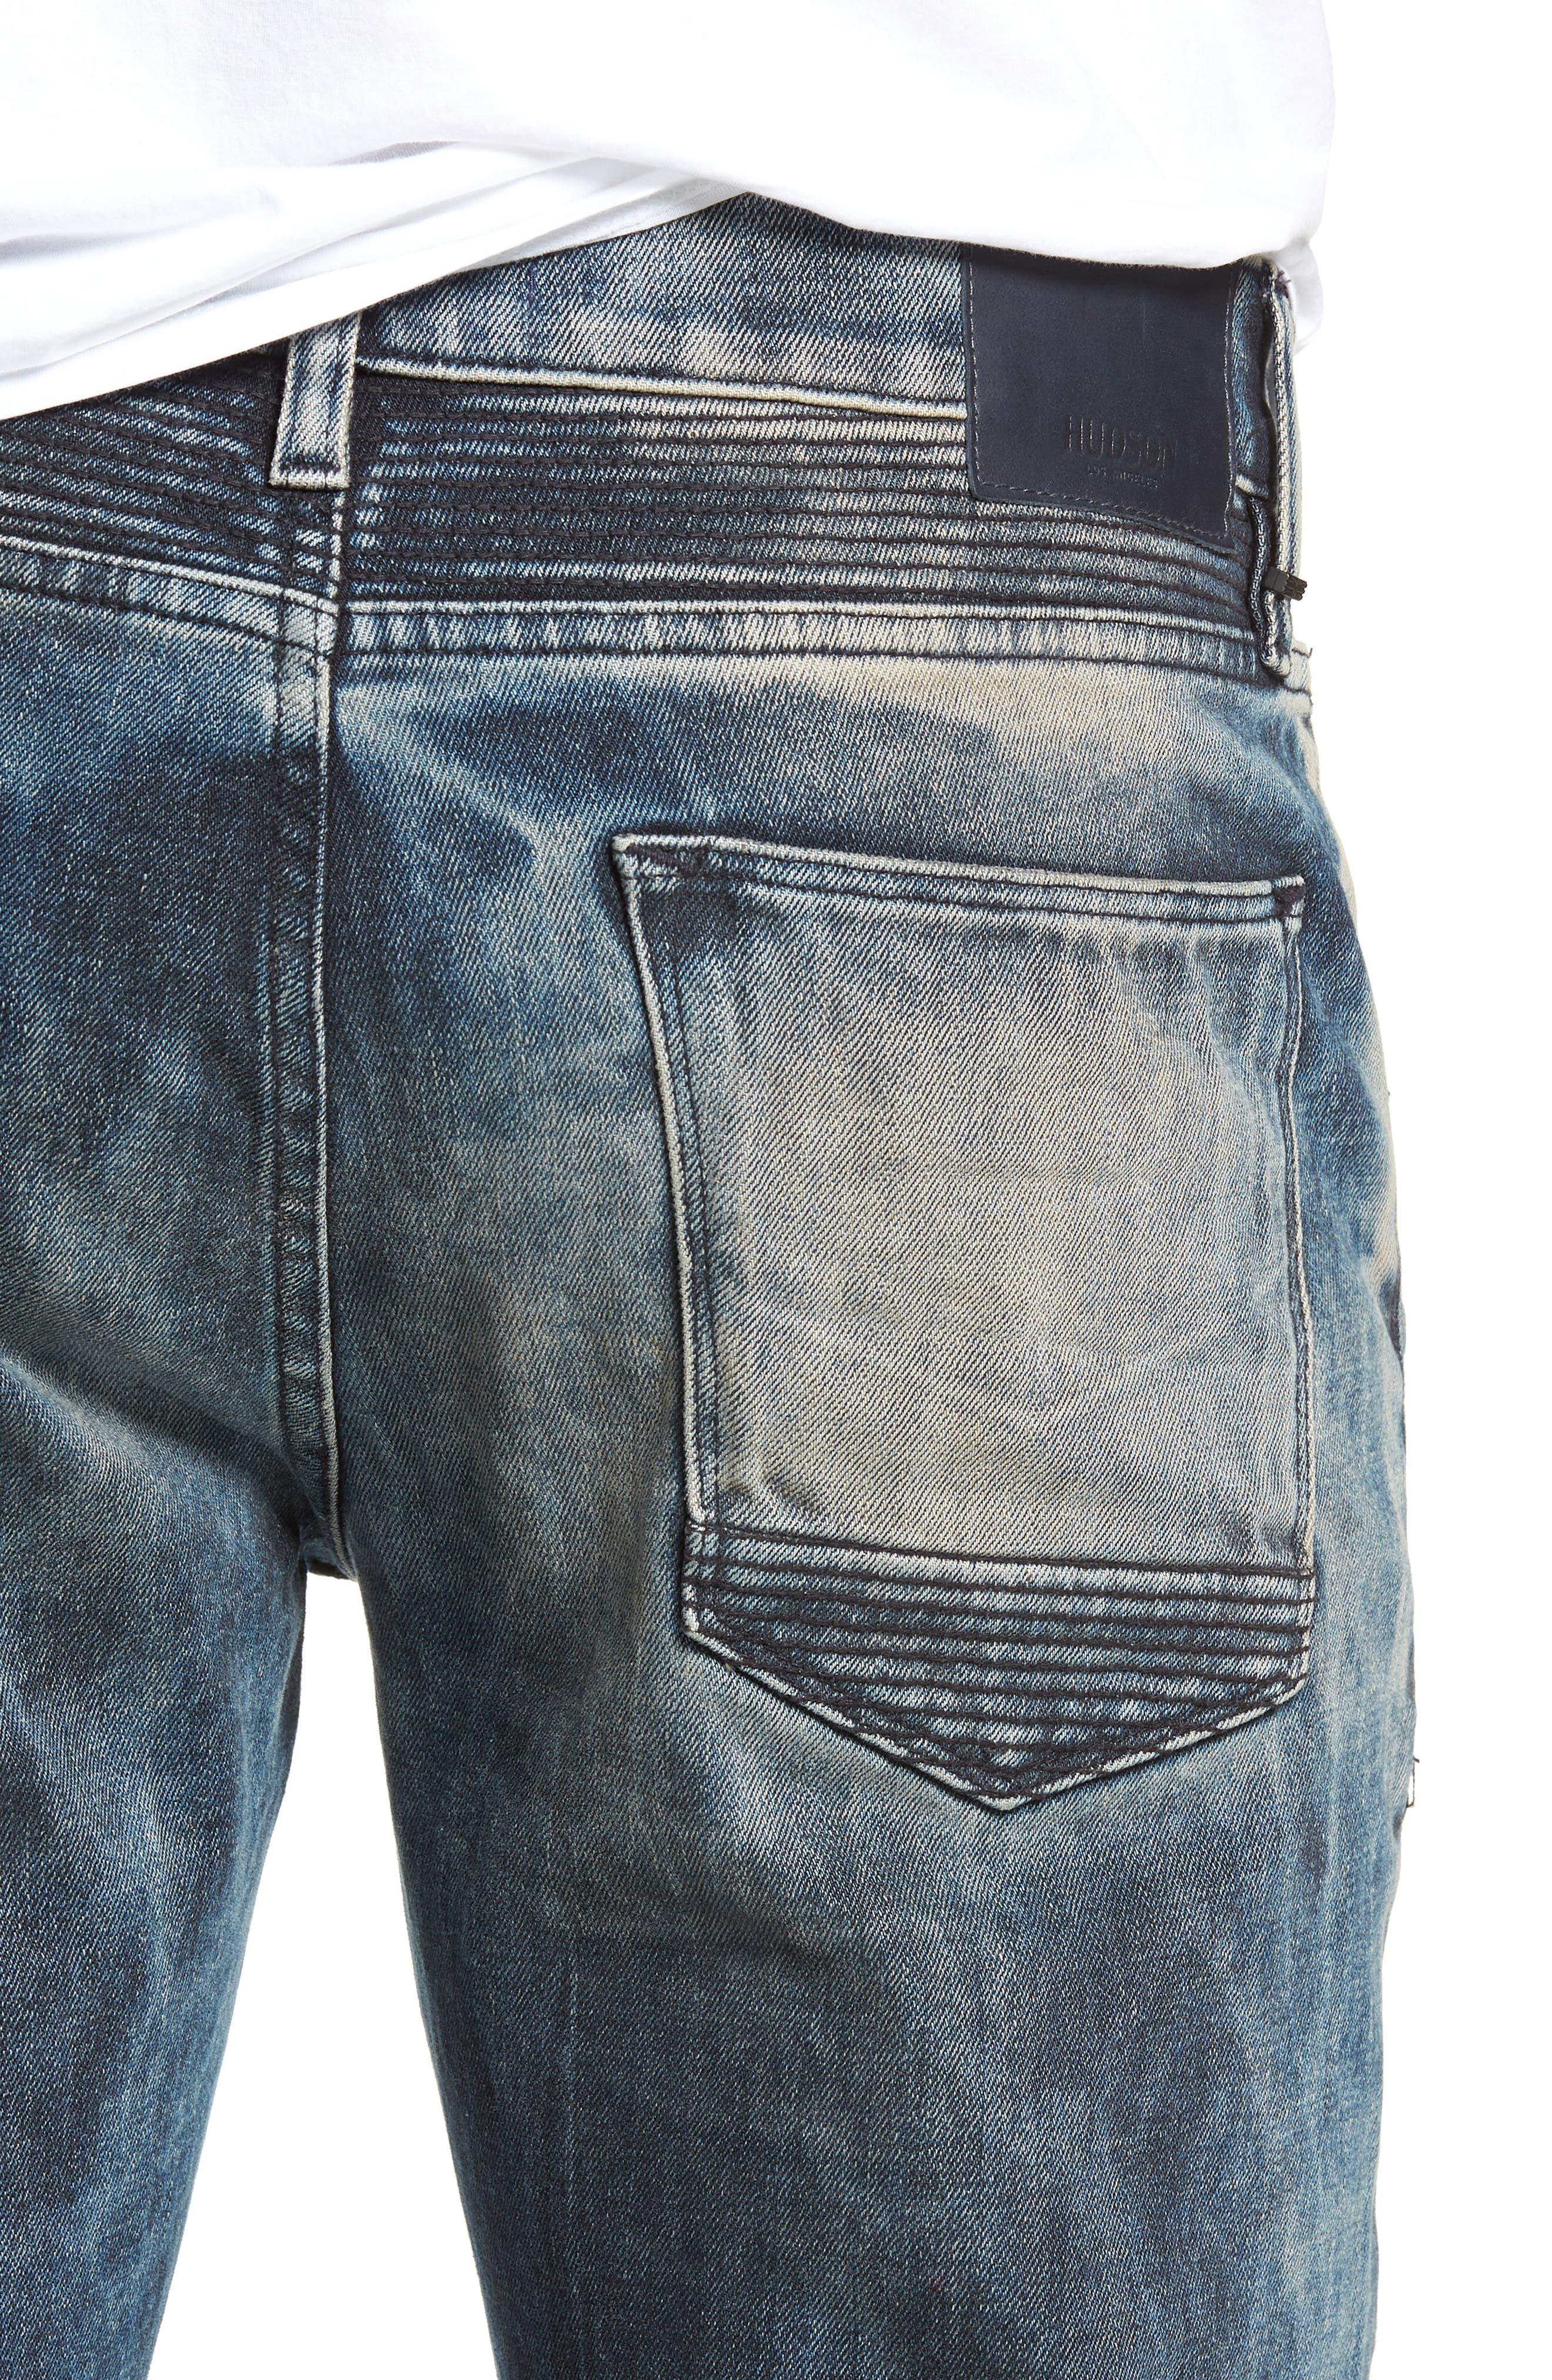 Blinder Biker Skinny Fit Jeans,                             Alternate thumbnail 4, color,                             MARTINO